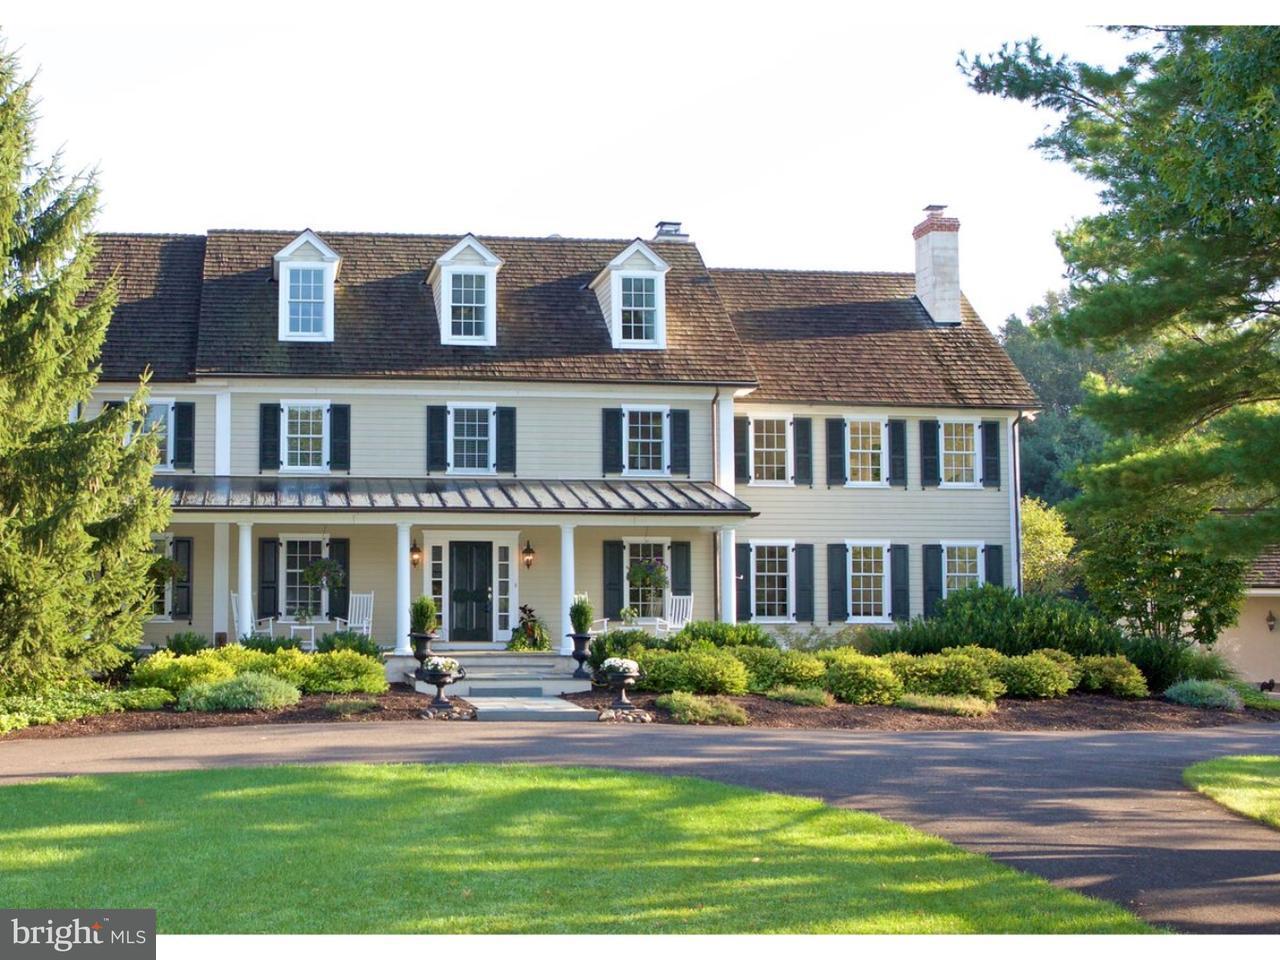 Single Family Home for Sale at 3929 THISAL Lane Buckingham, Pennsylvania 18902 United States